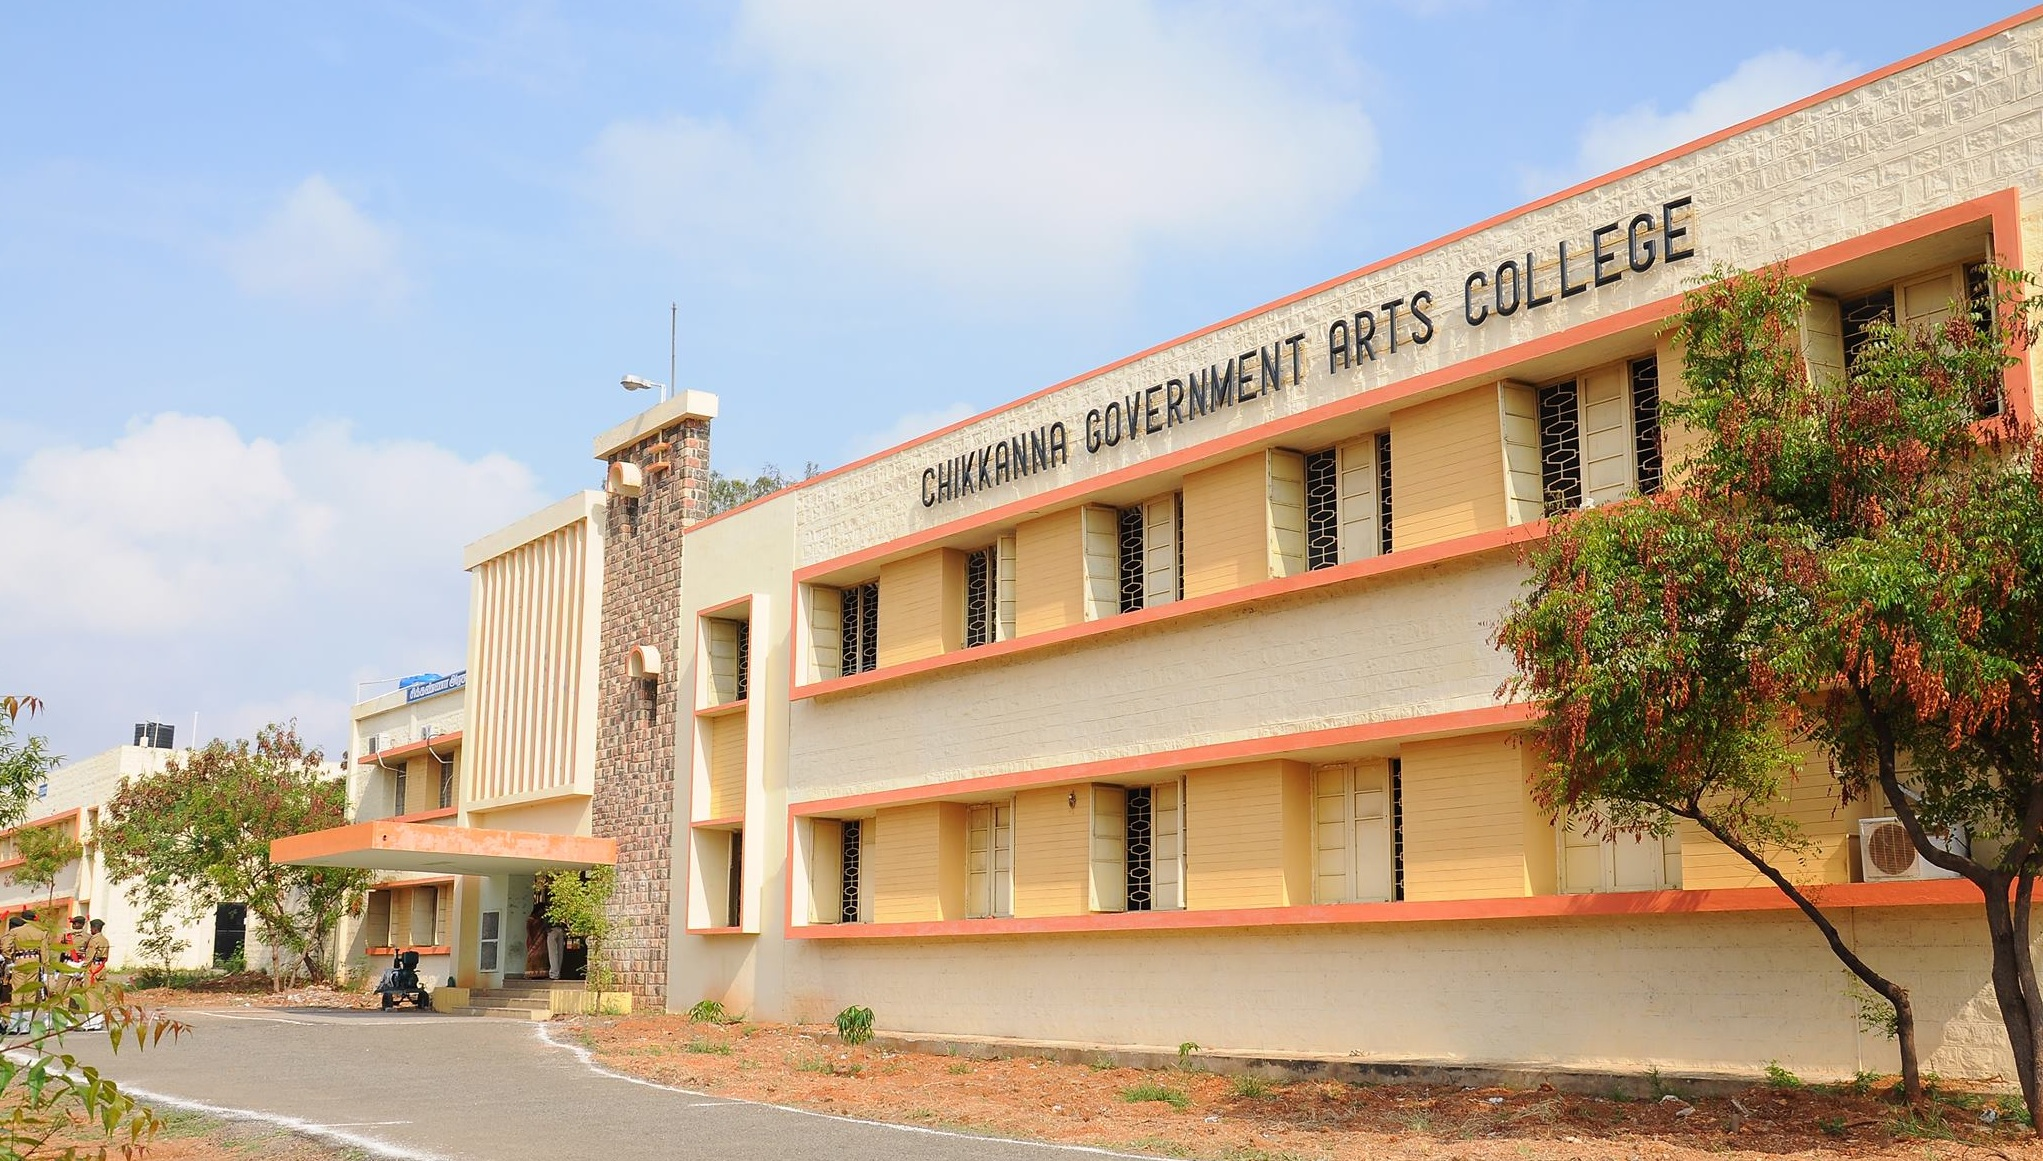 Chikanna government arts college, Tirupur